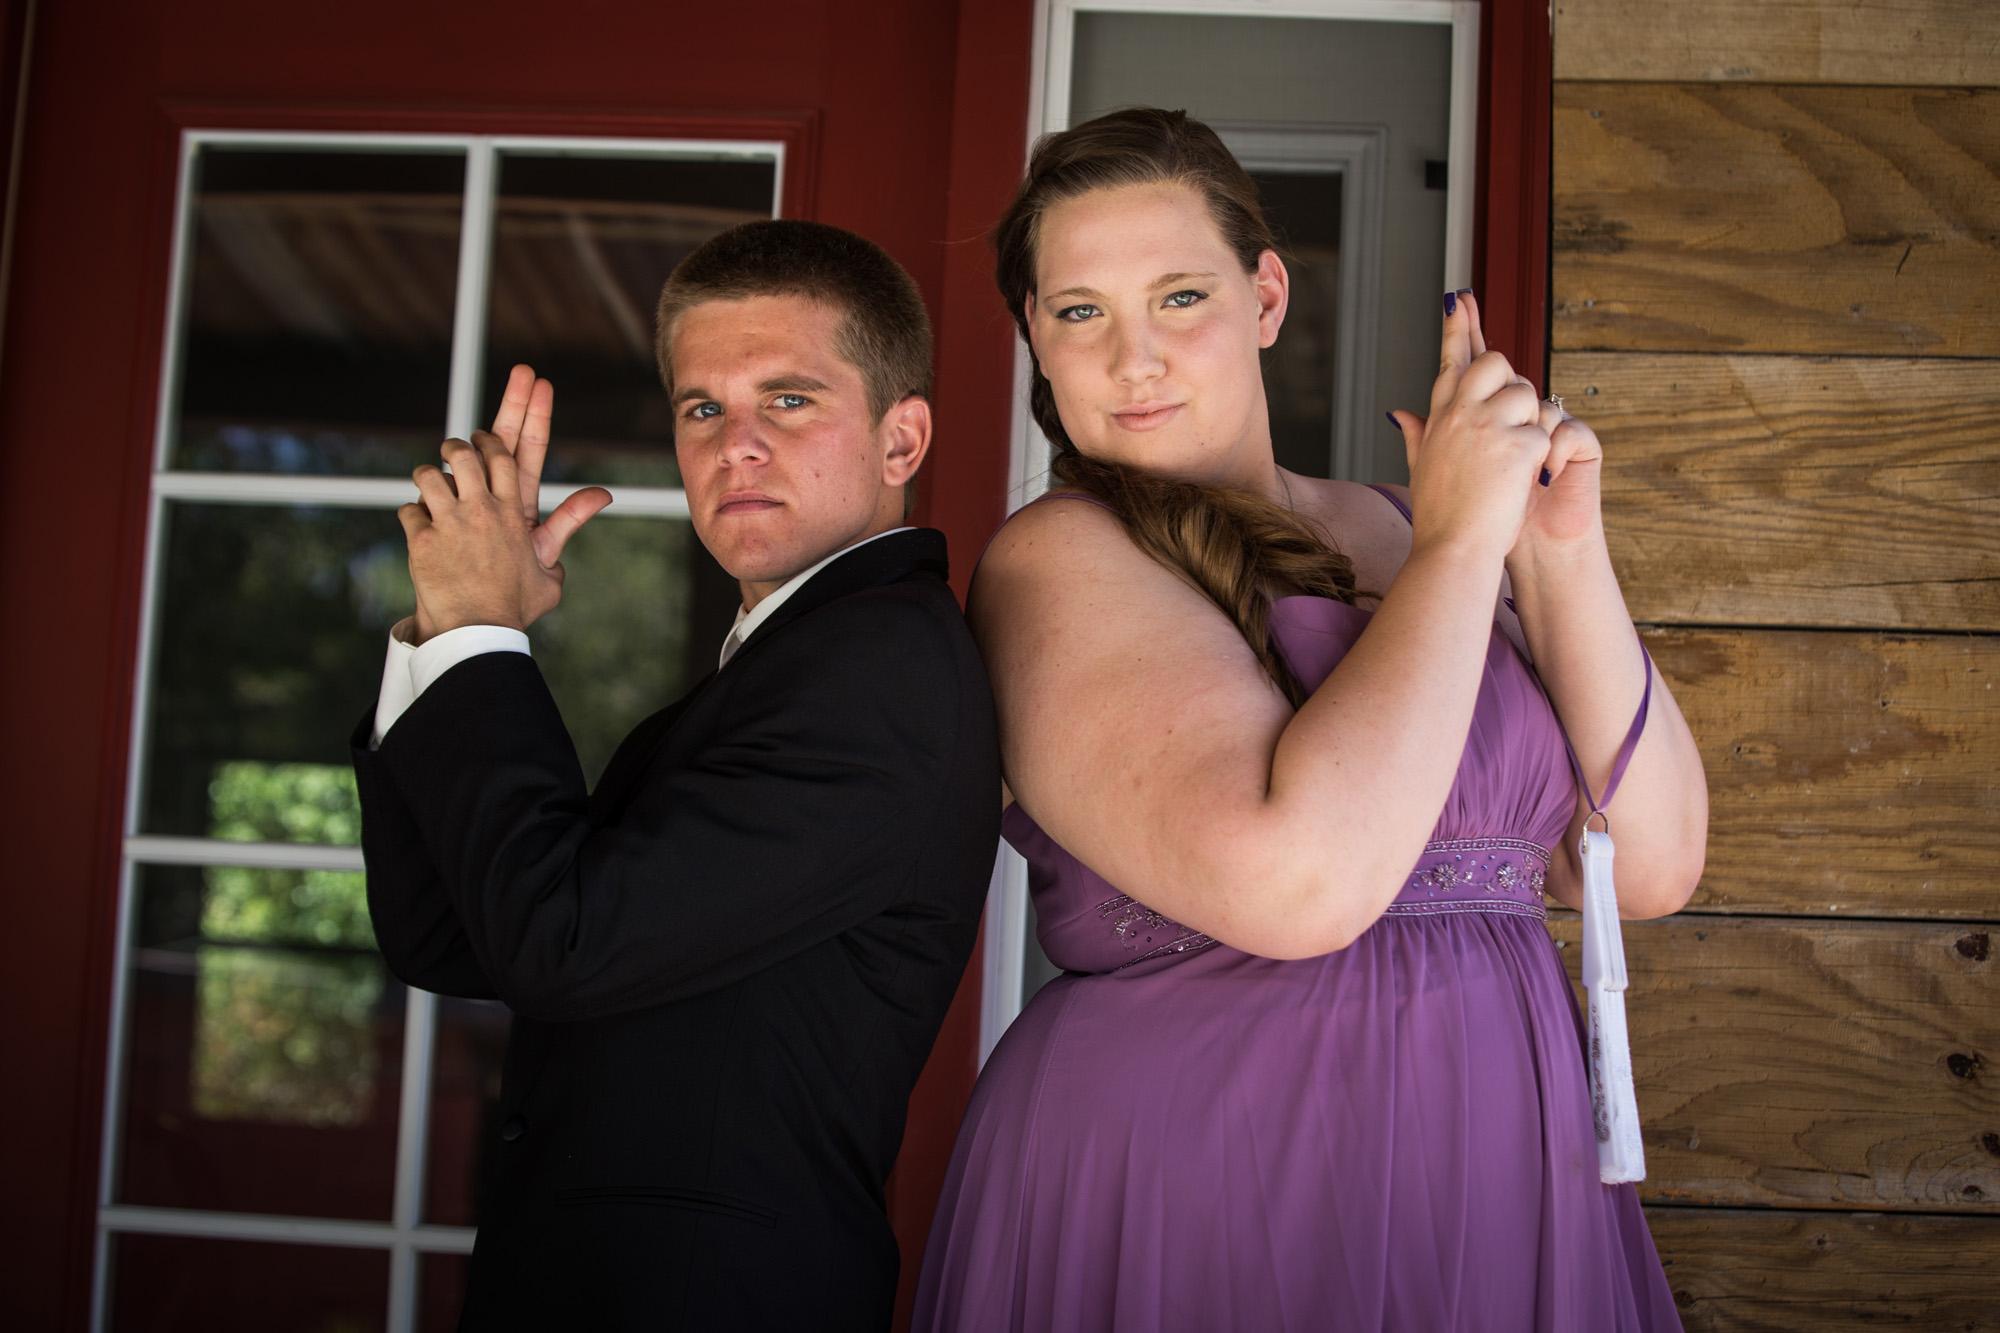 bridal party wearing purple